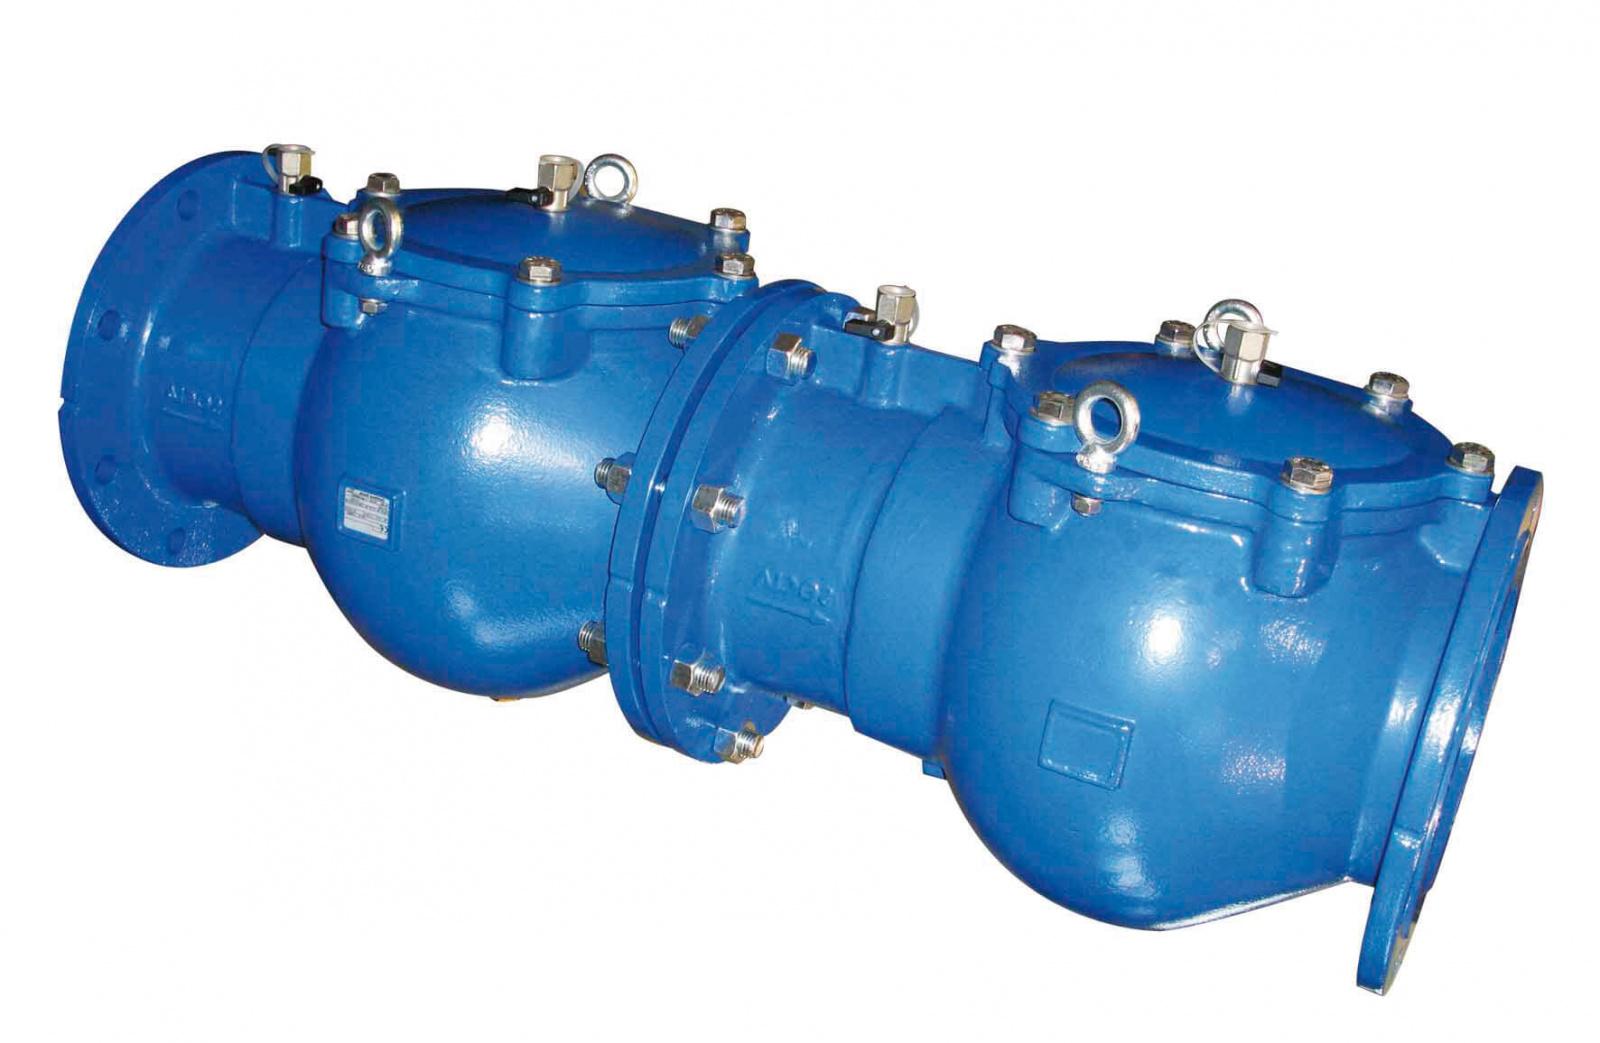 EC 453/453 Drinking Water Backflow Preventor (Double Check)